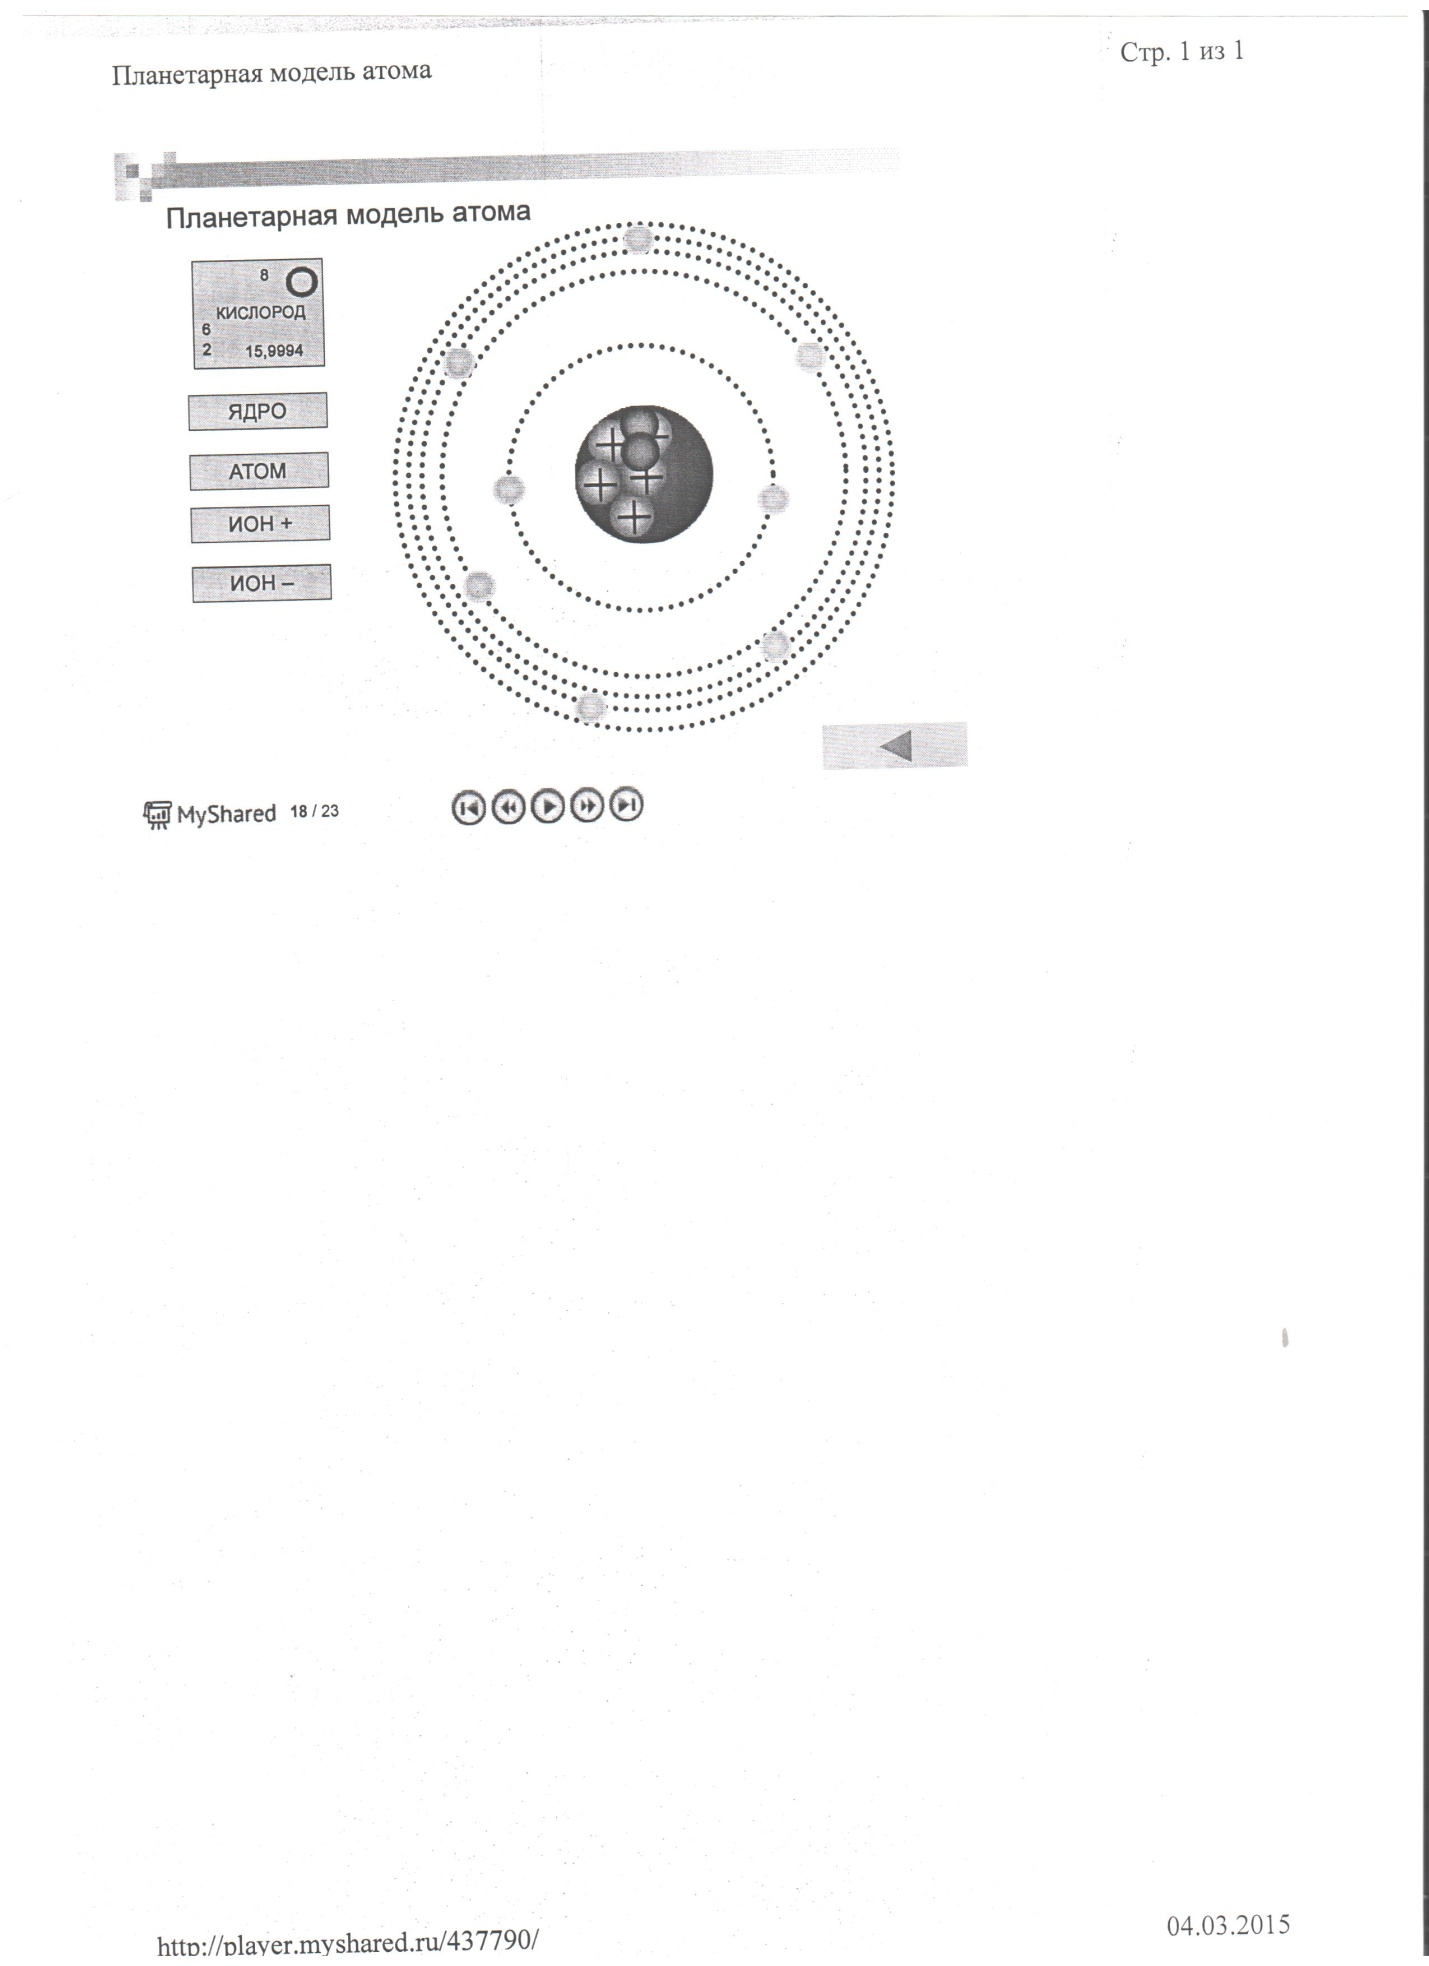 C:\Users\Неверова ЛП\Documents\Scanned Documents\Рисунок (139).jpg